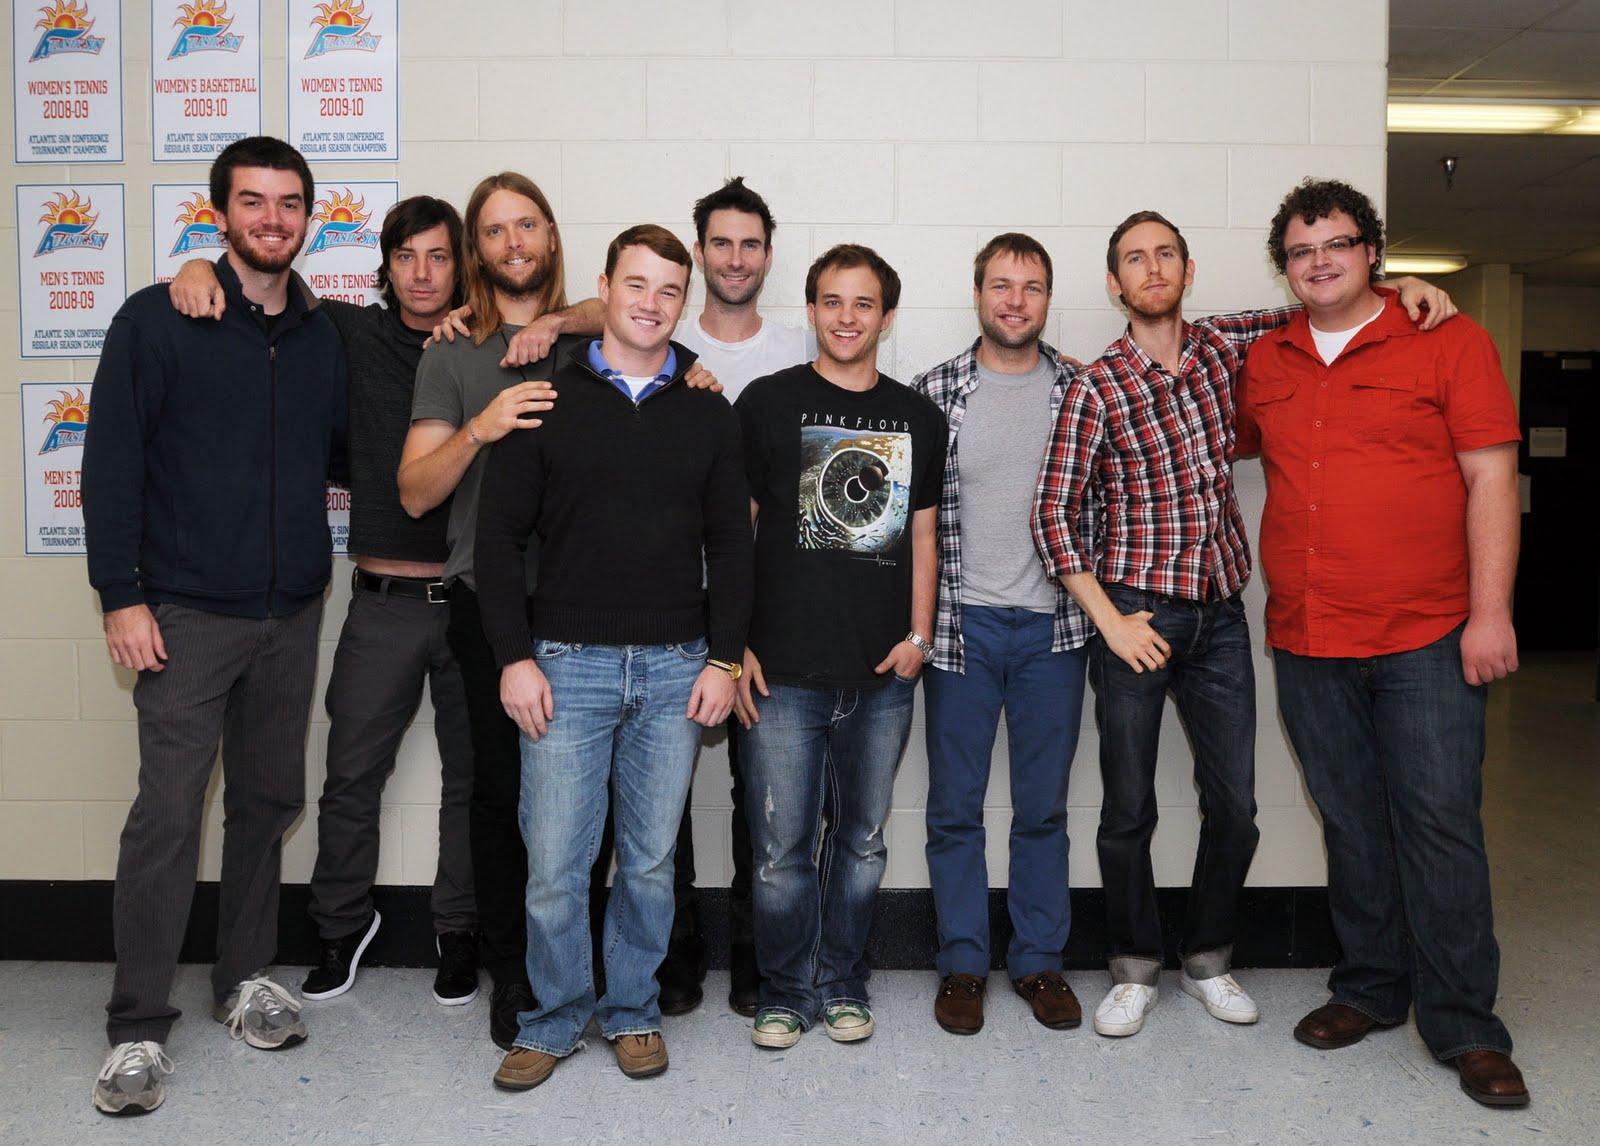 Sga concert photos maroon 5 meet and greets maroon 5 meet and greets m4hsunfo